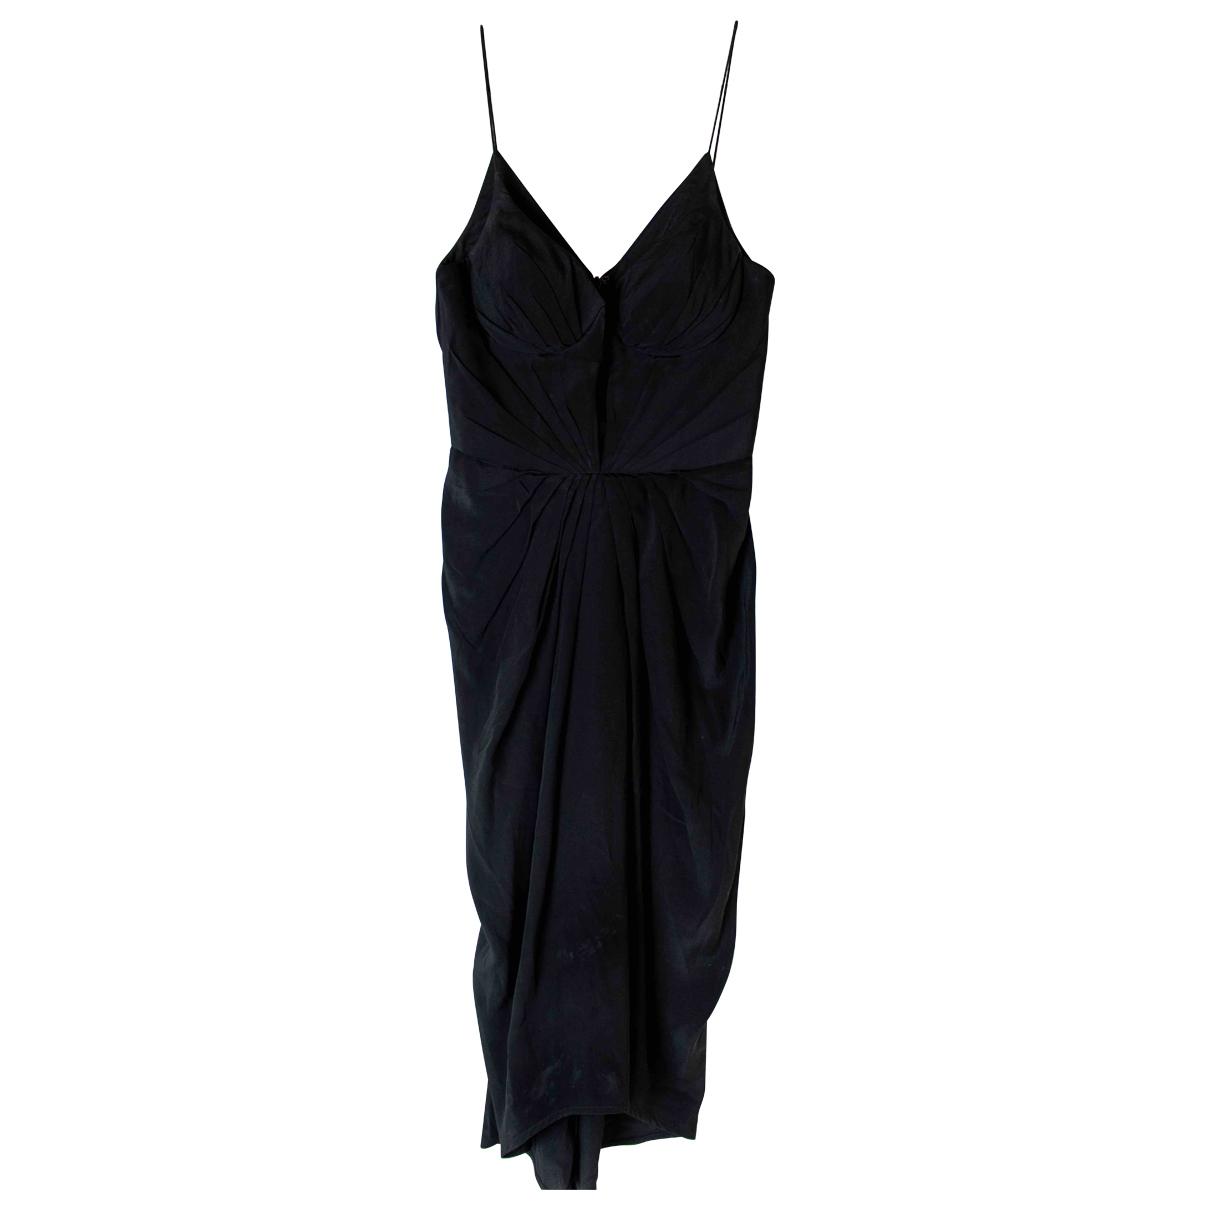 Zimmermann \N Black Silk dress for Women 0 0-5